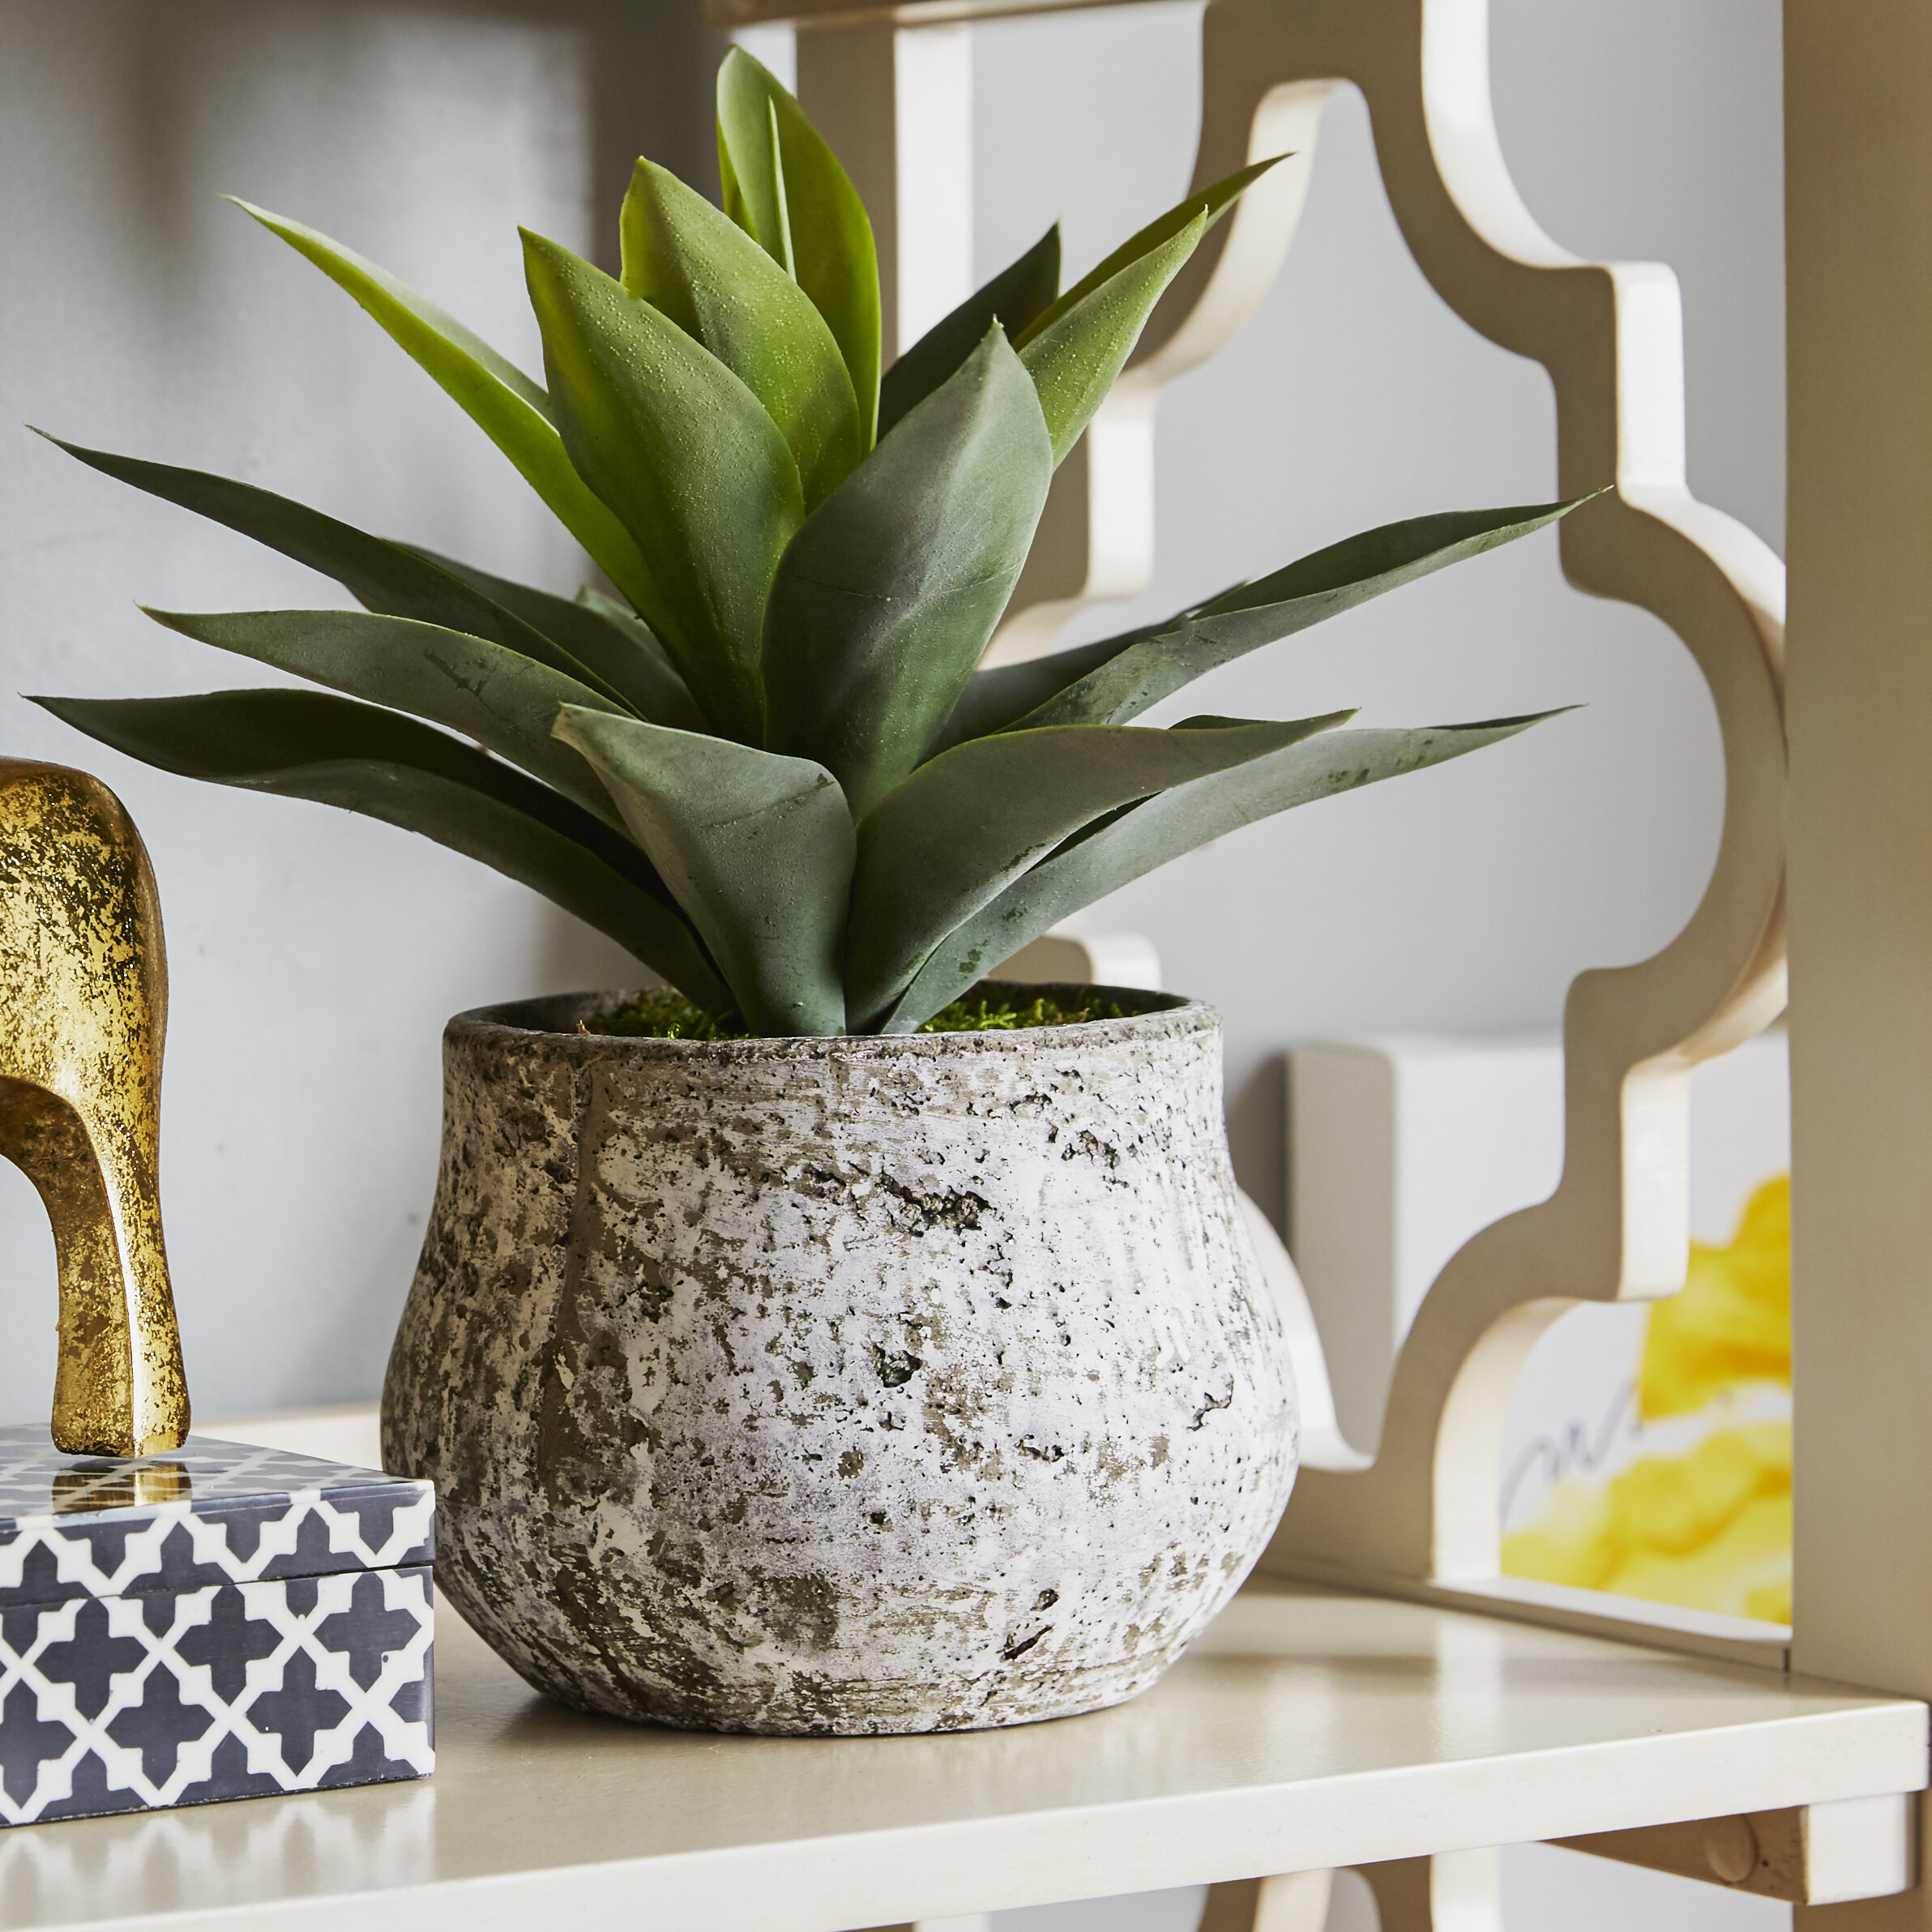 House of silk flowers inc wayfair artificial succulent desk top plant in pot by house of silk flowers mightylinksfo